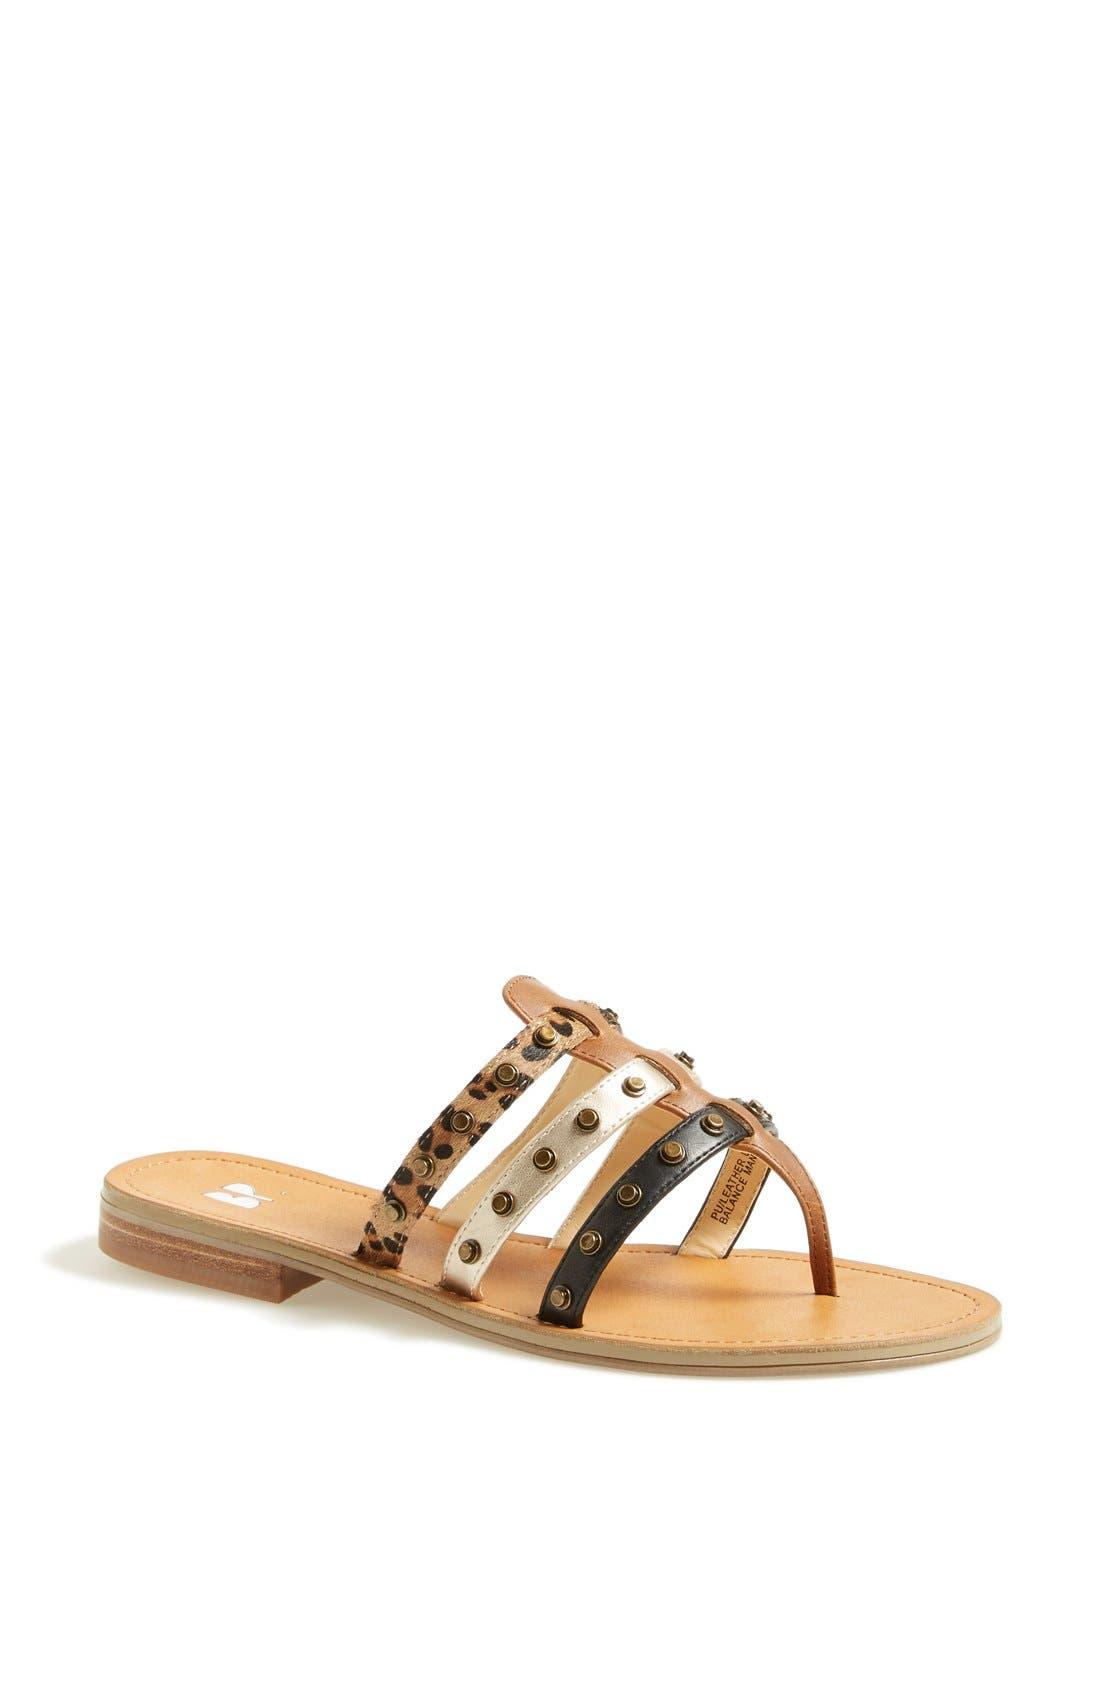 Main Image - BP. 'Kastoria' Flat Sandal